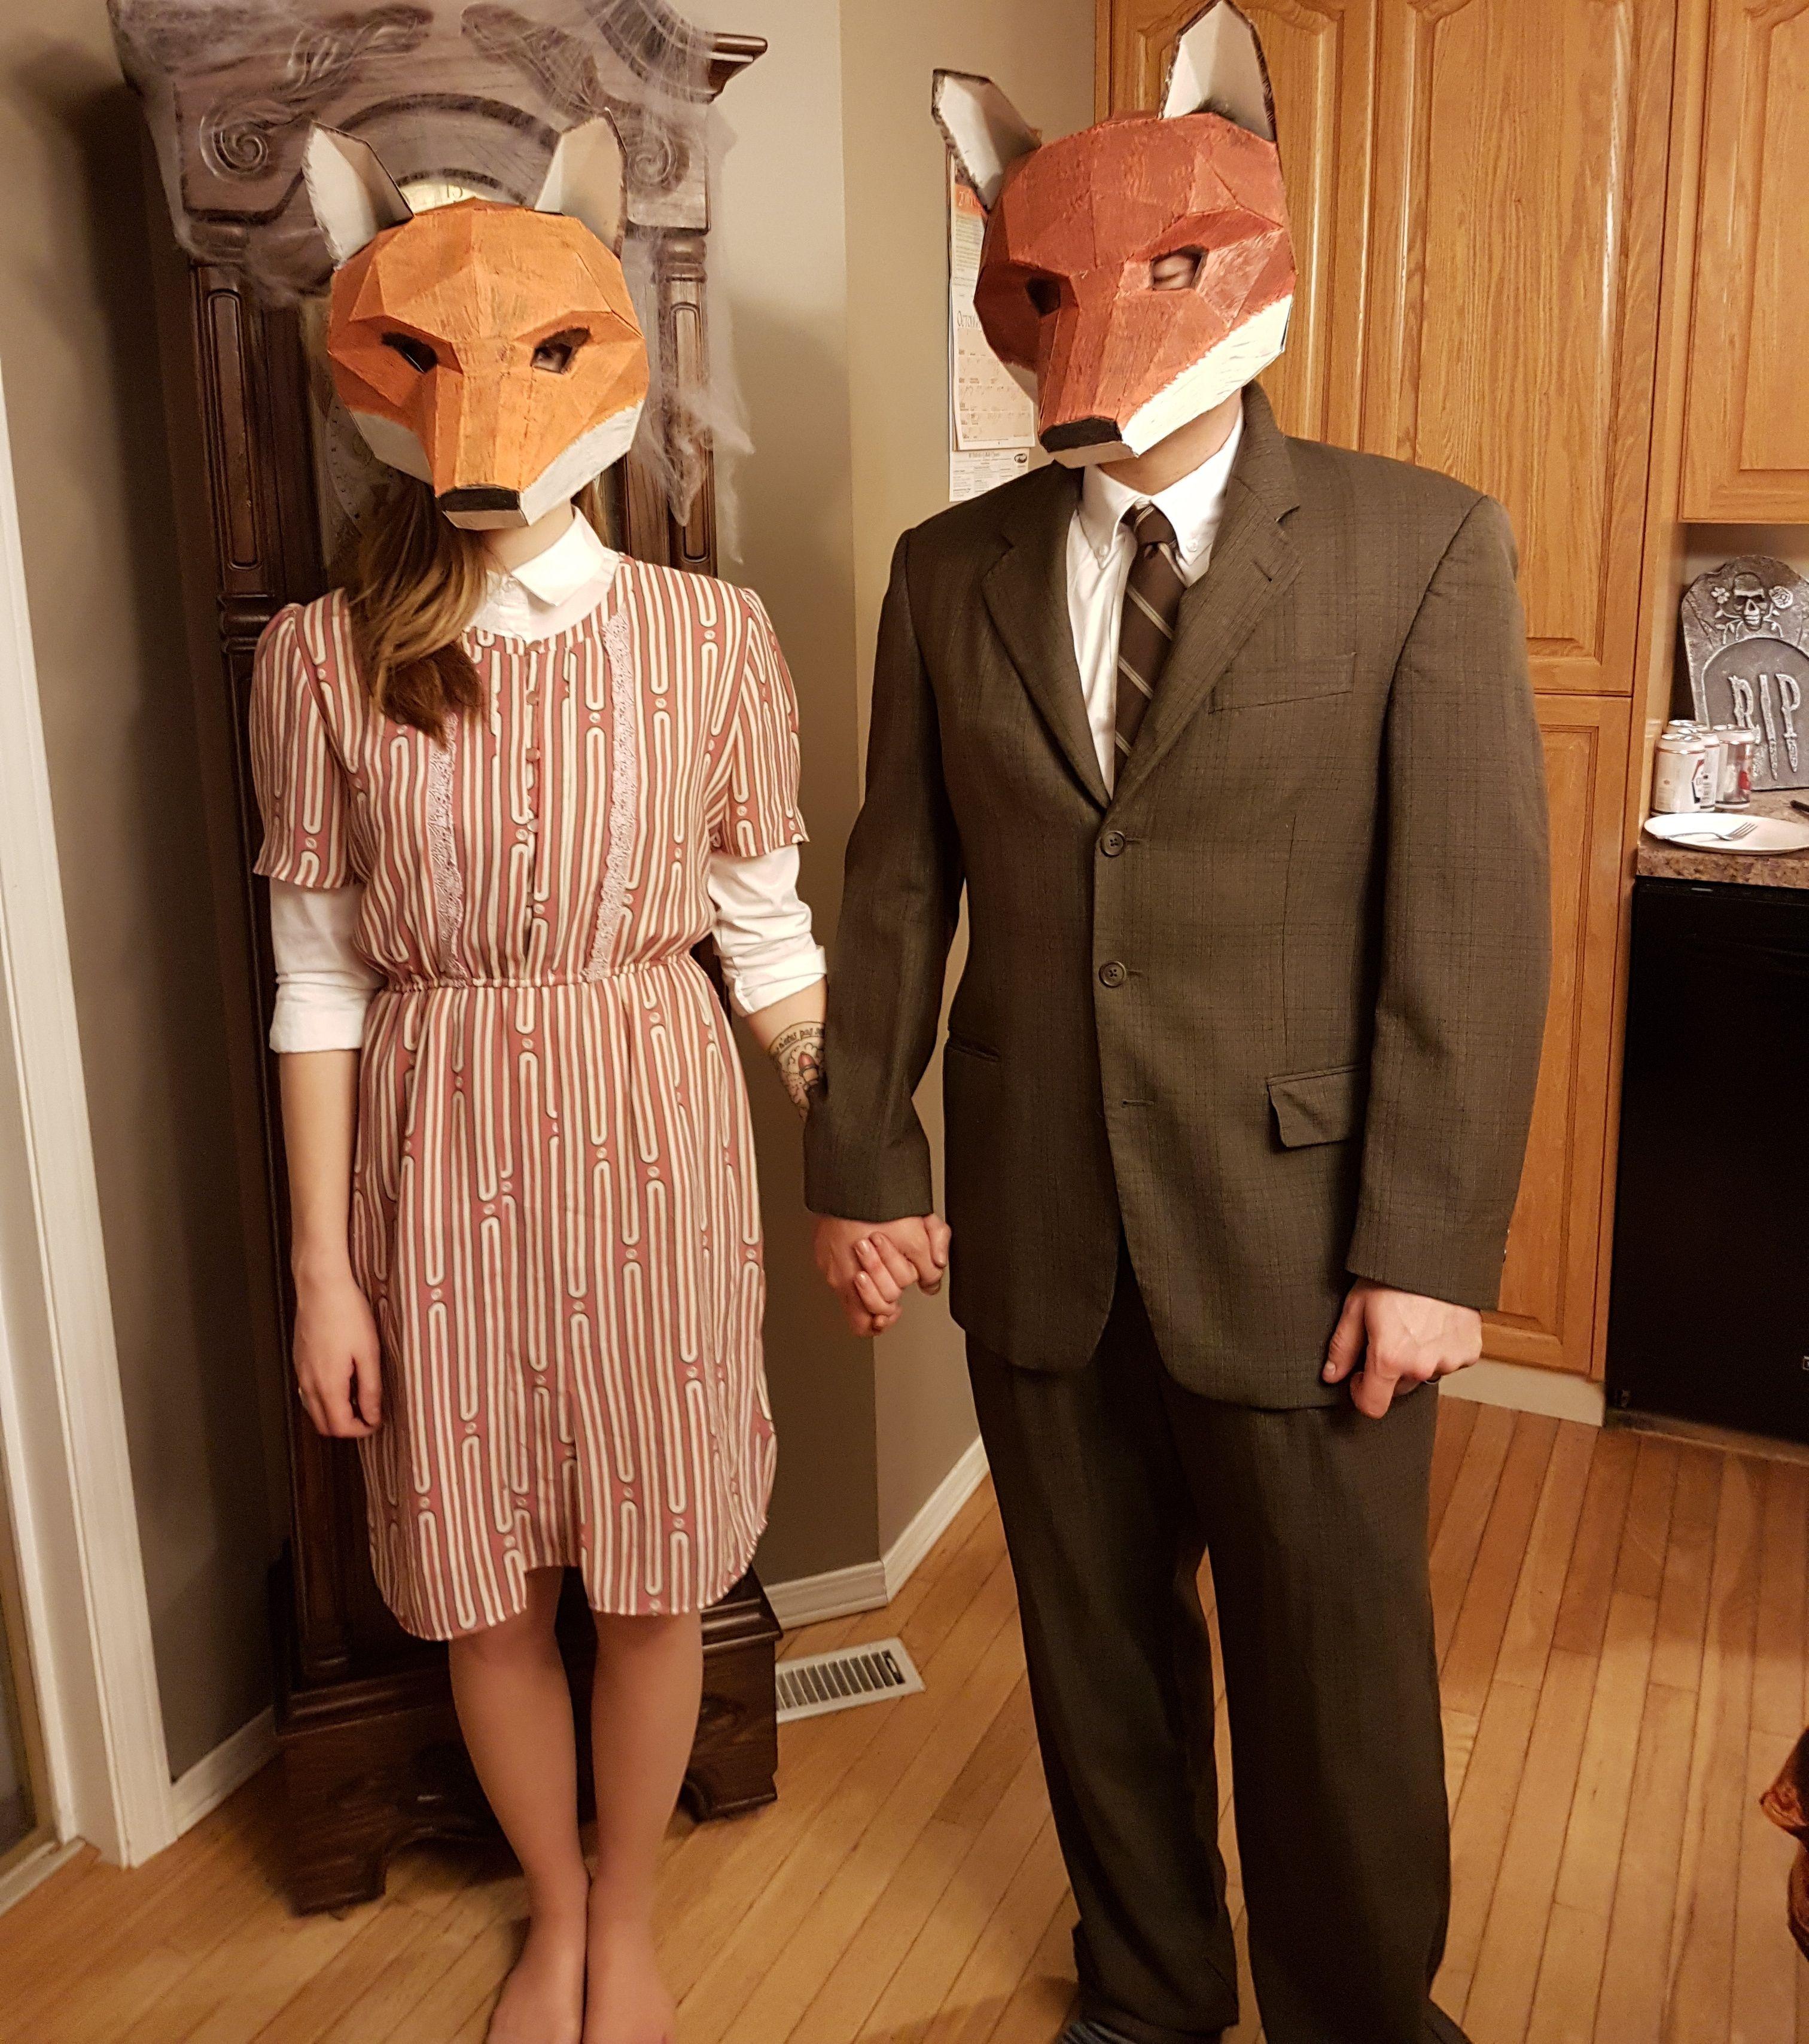 Mr and Mrs Fantastic Fox costume - Imgur